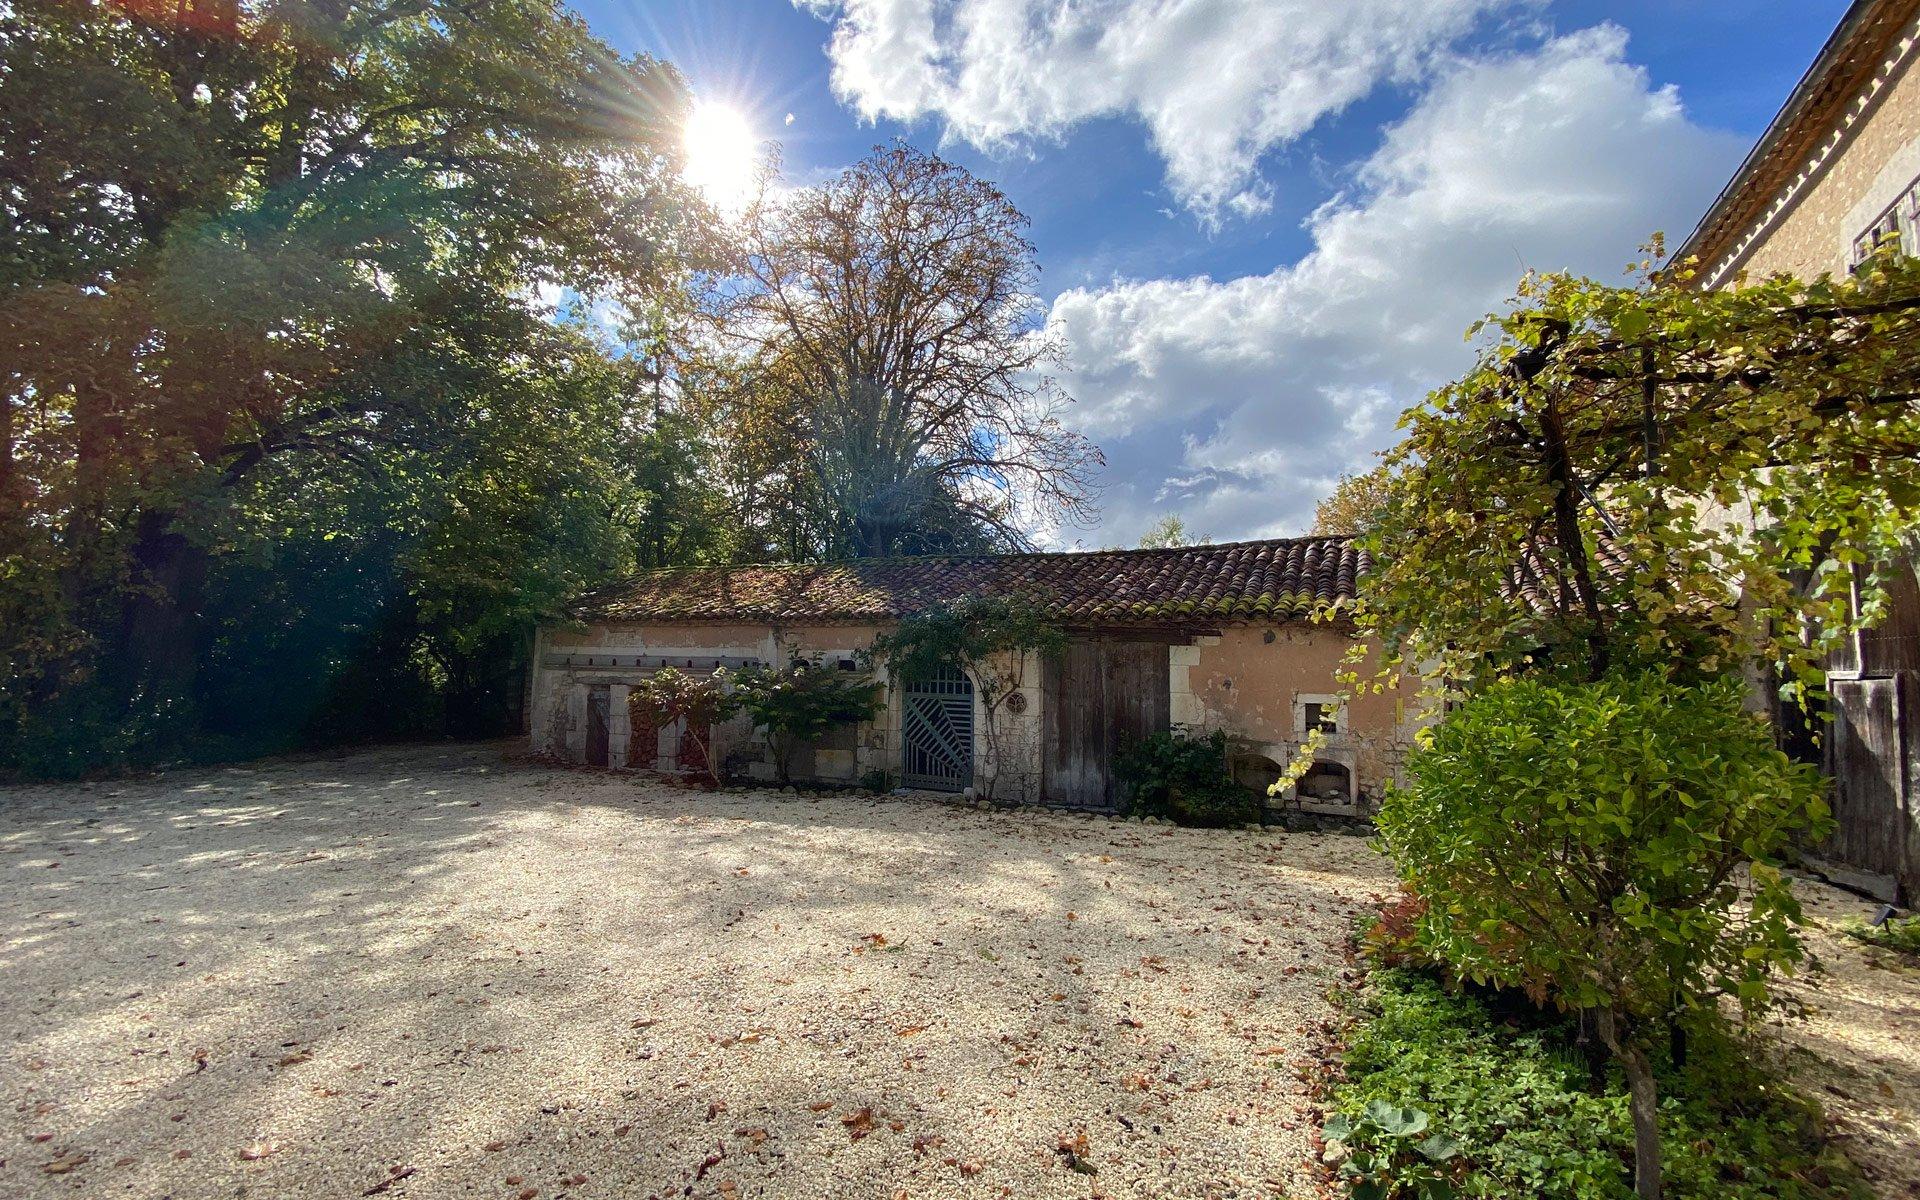 Manoir Beaulieu courtyard